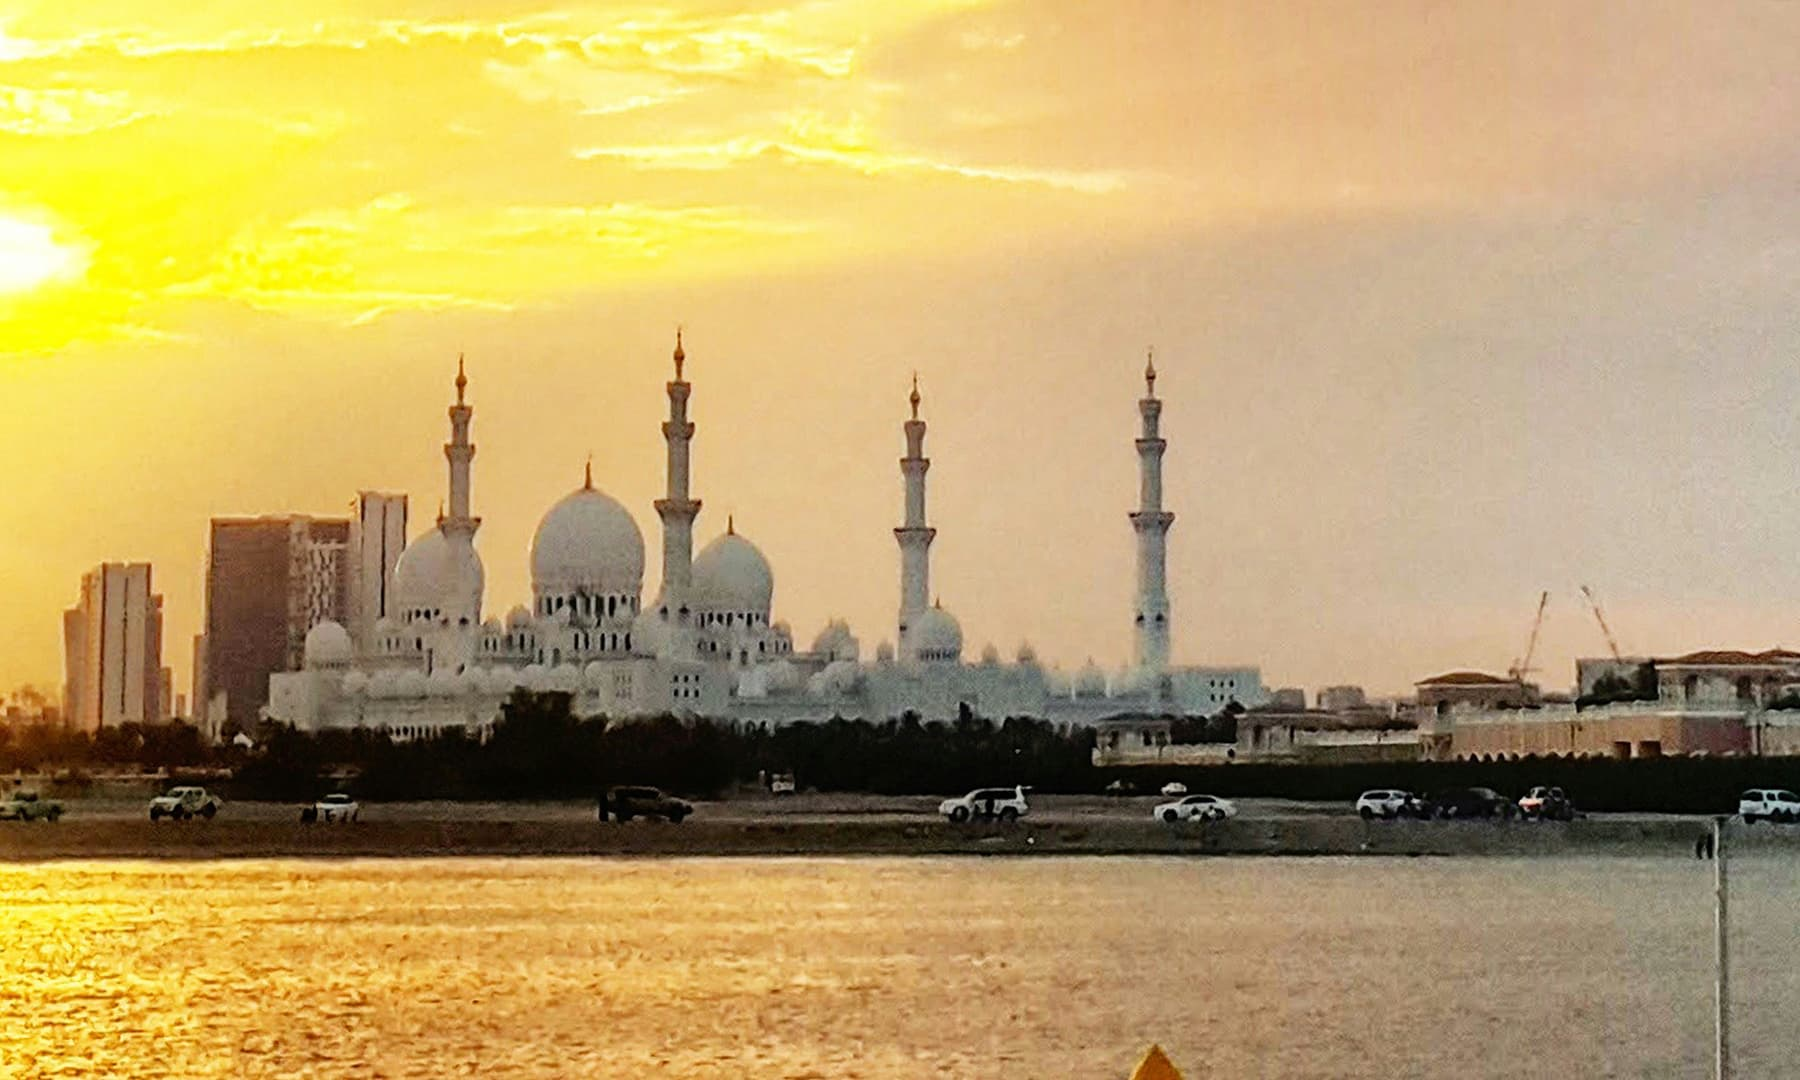 شیخ زید مسجد — تصویر صوفیہ کاشف